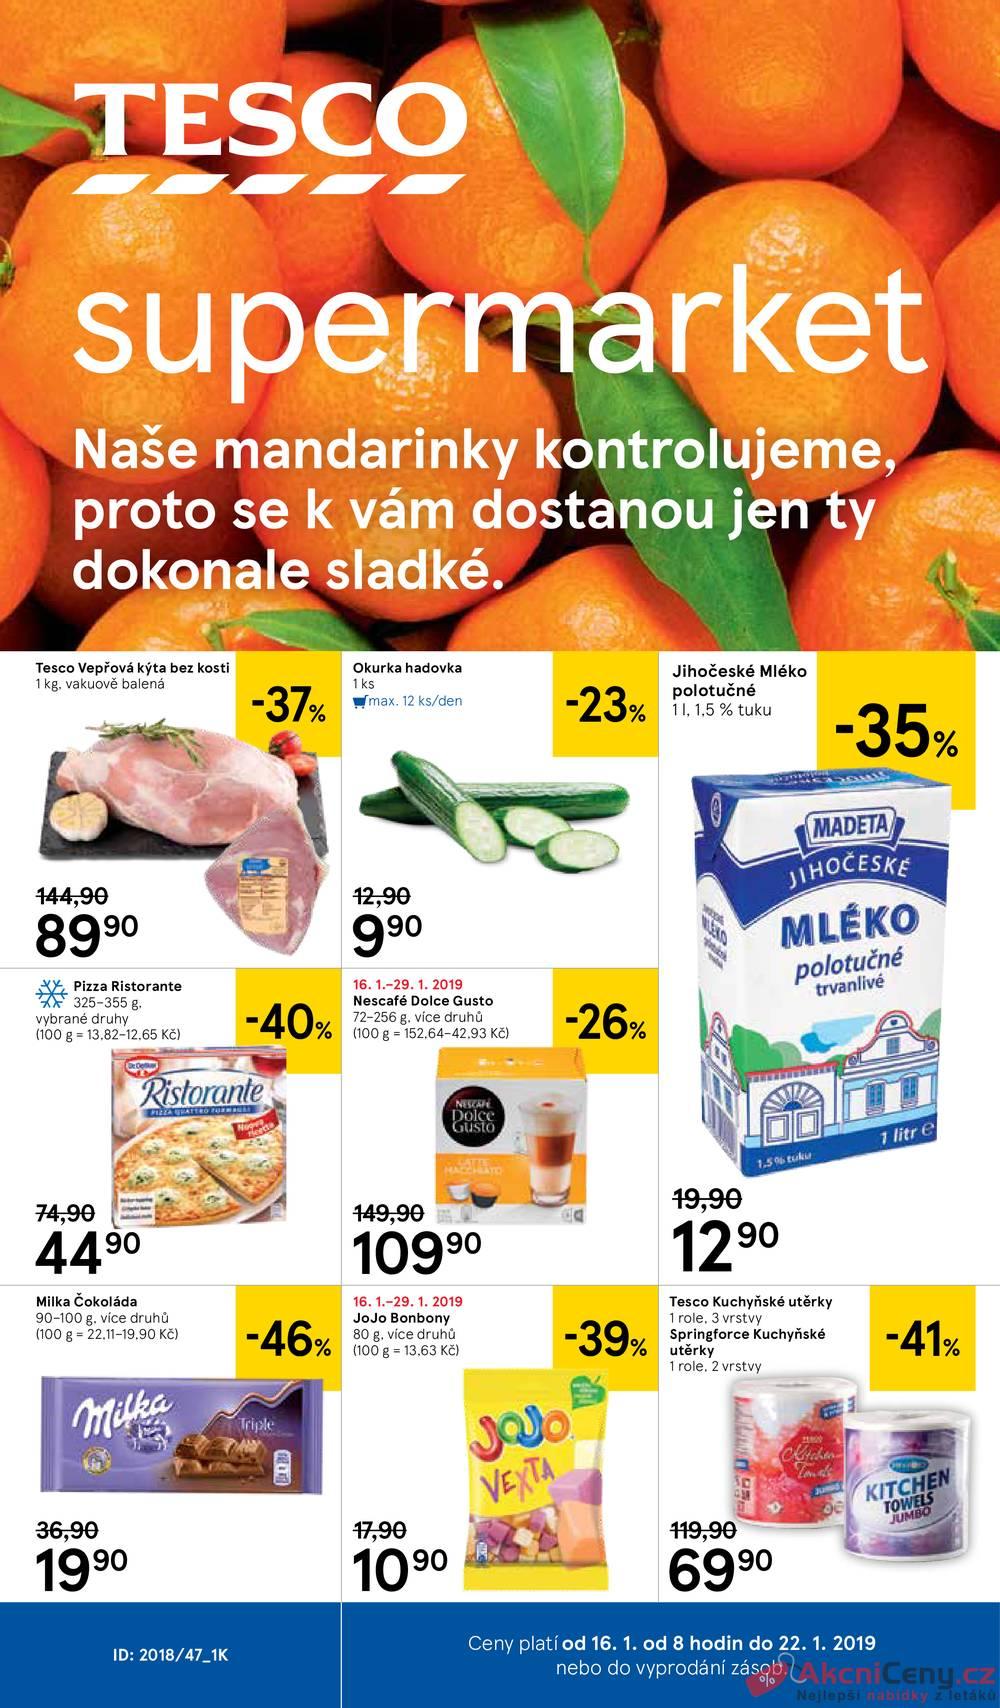 Tesco supermarkety 16.1. - 22.1.